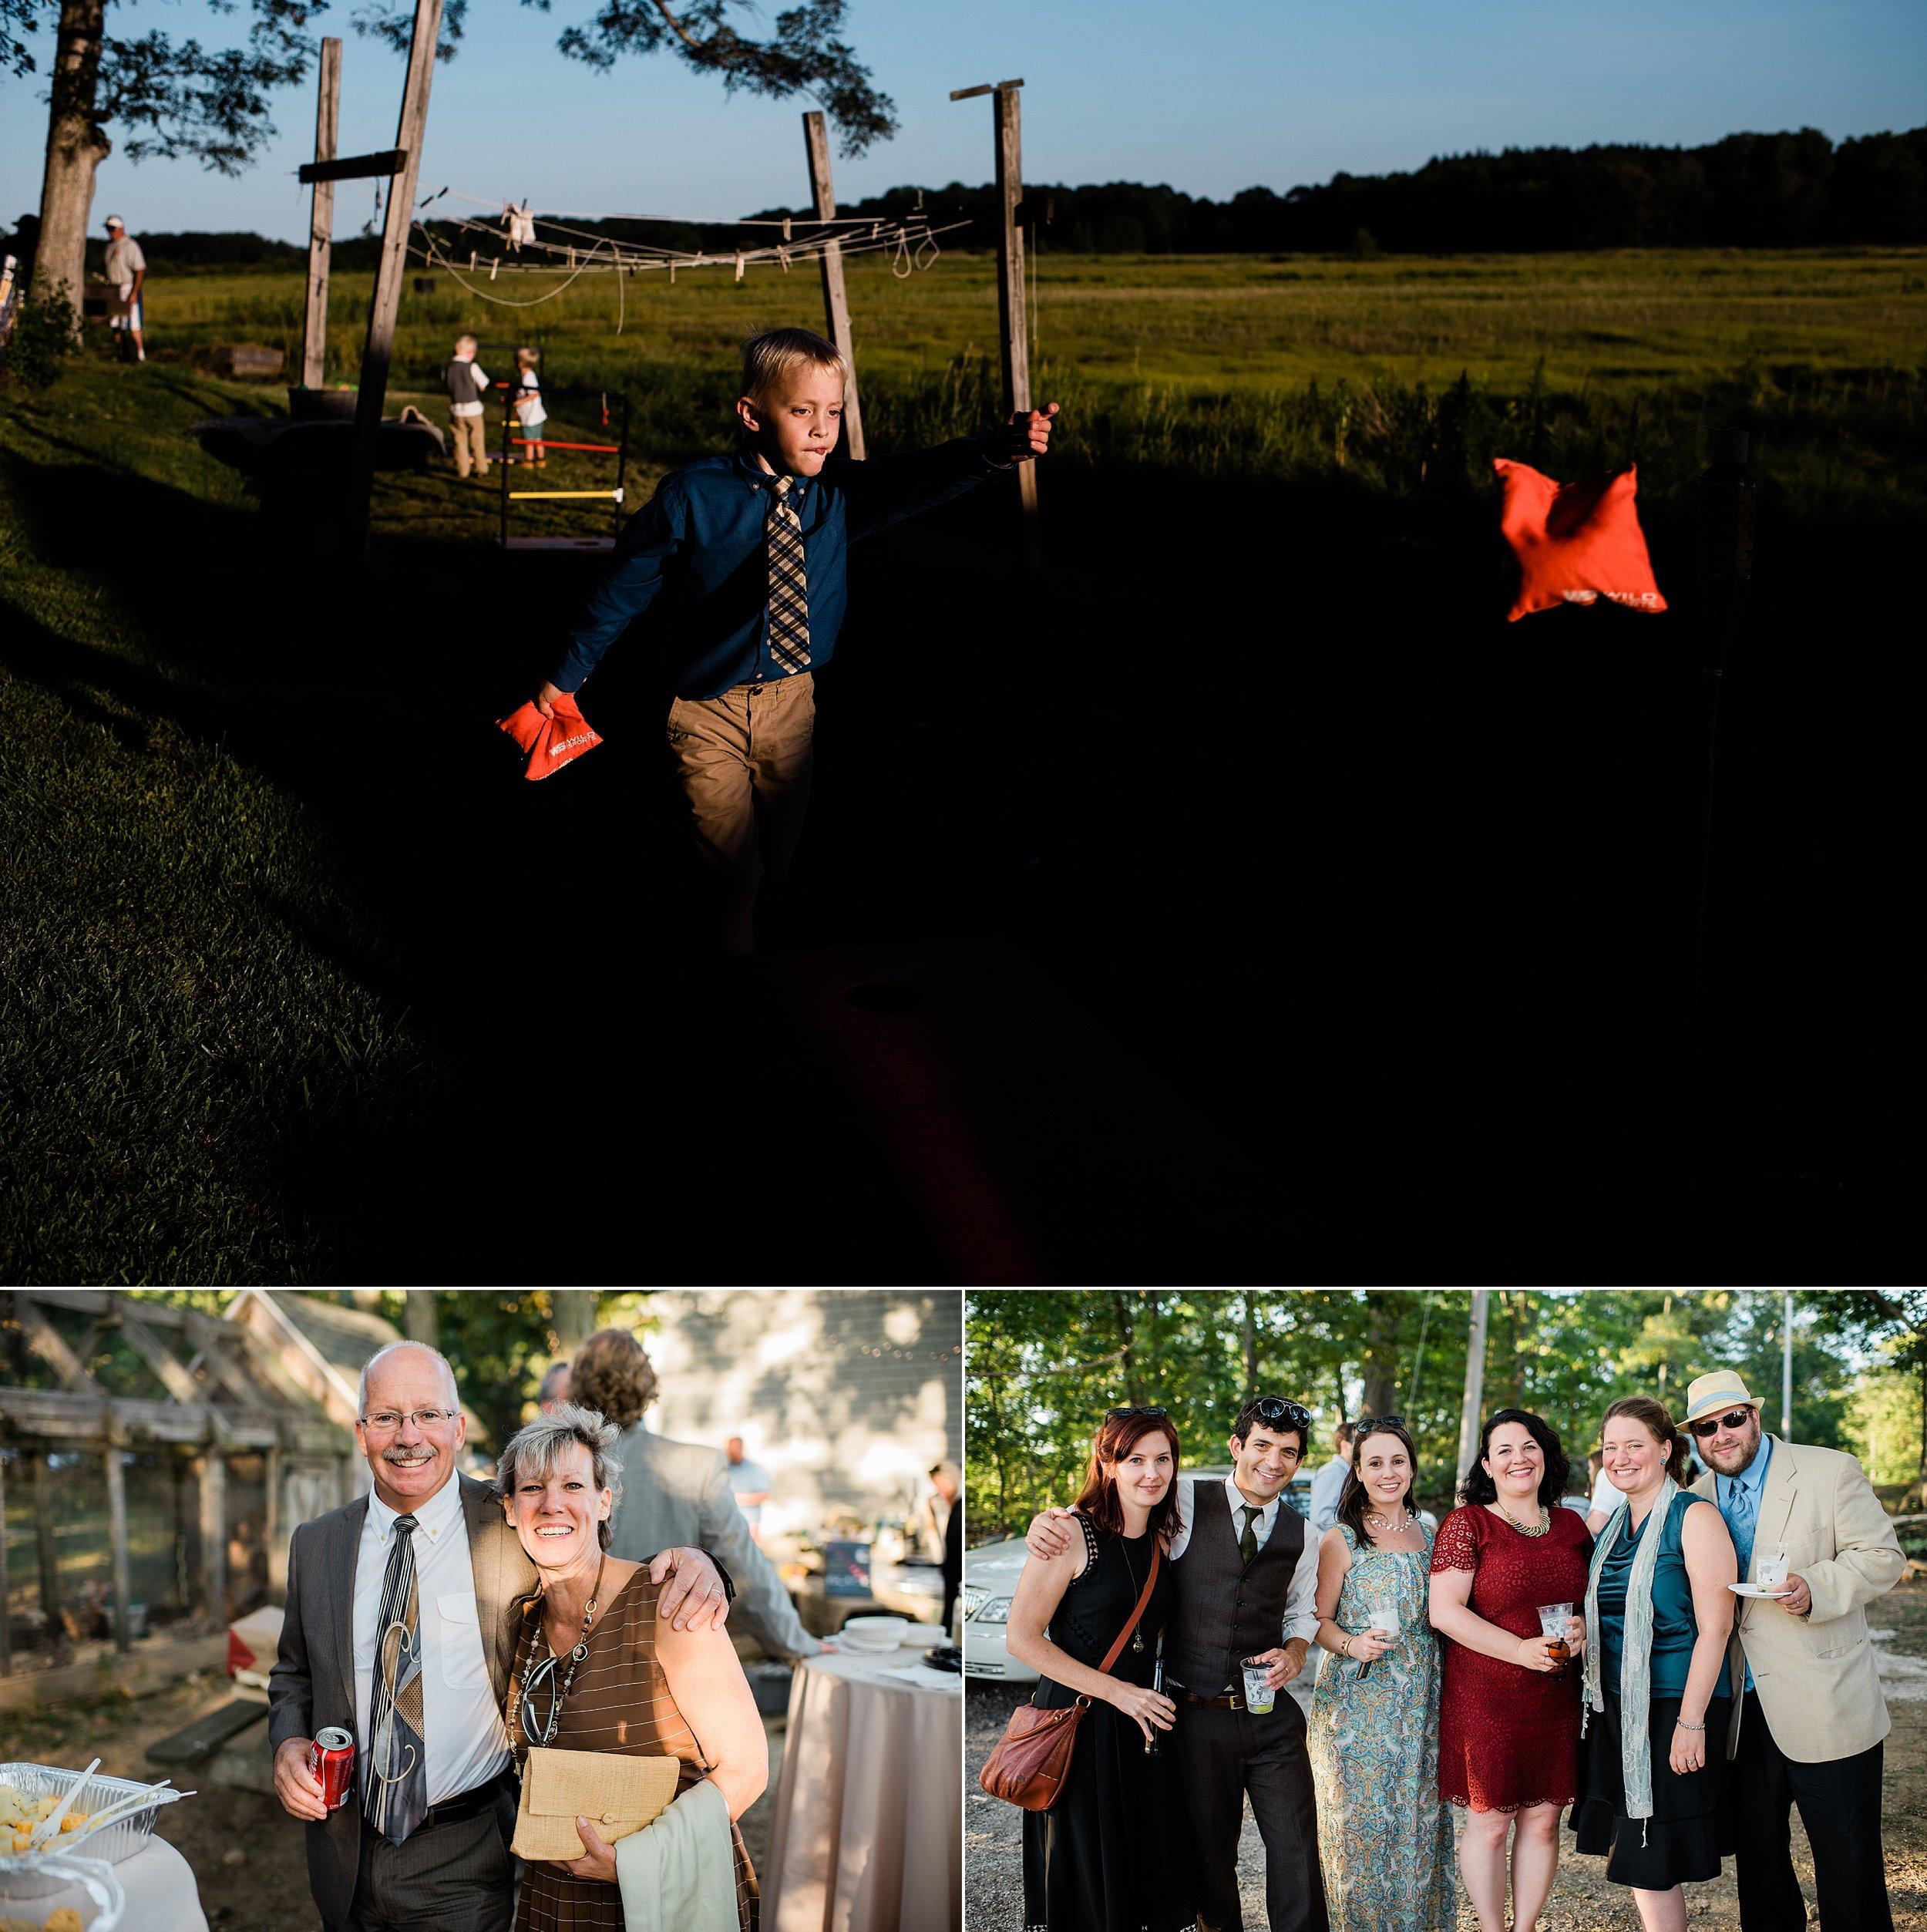 056 los angeles wedding photographer.jpg